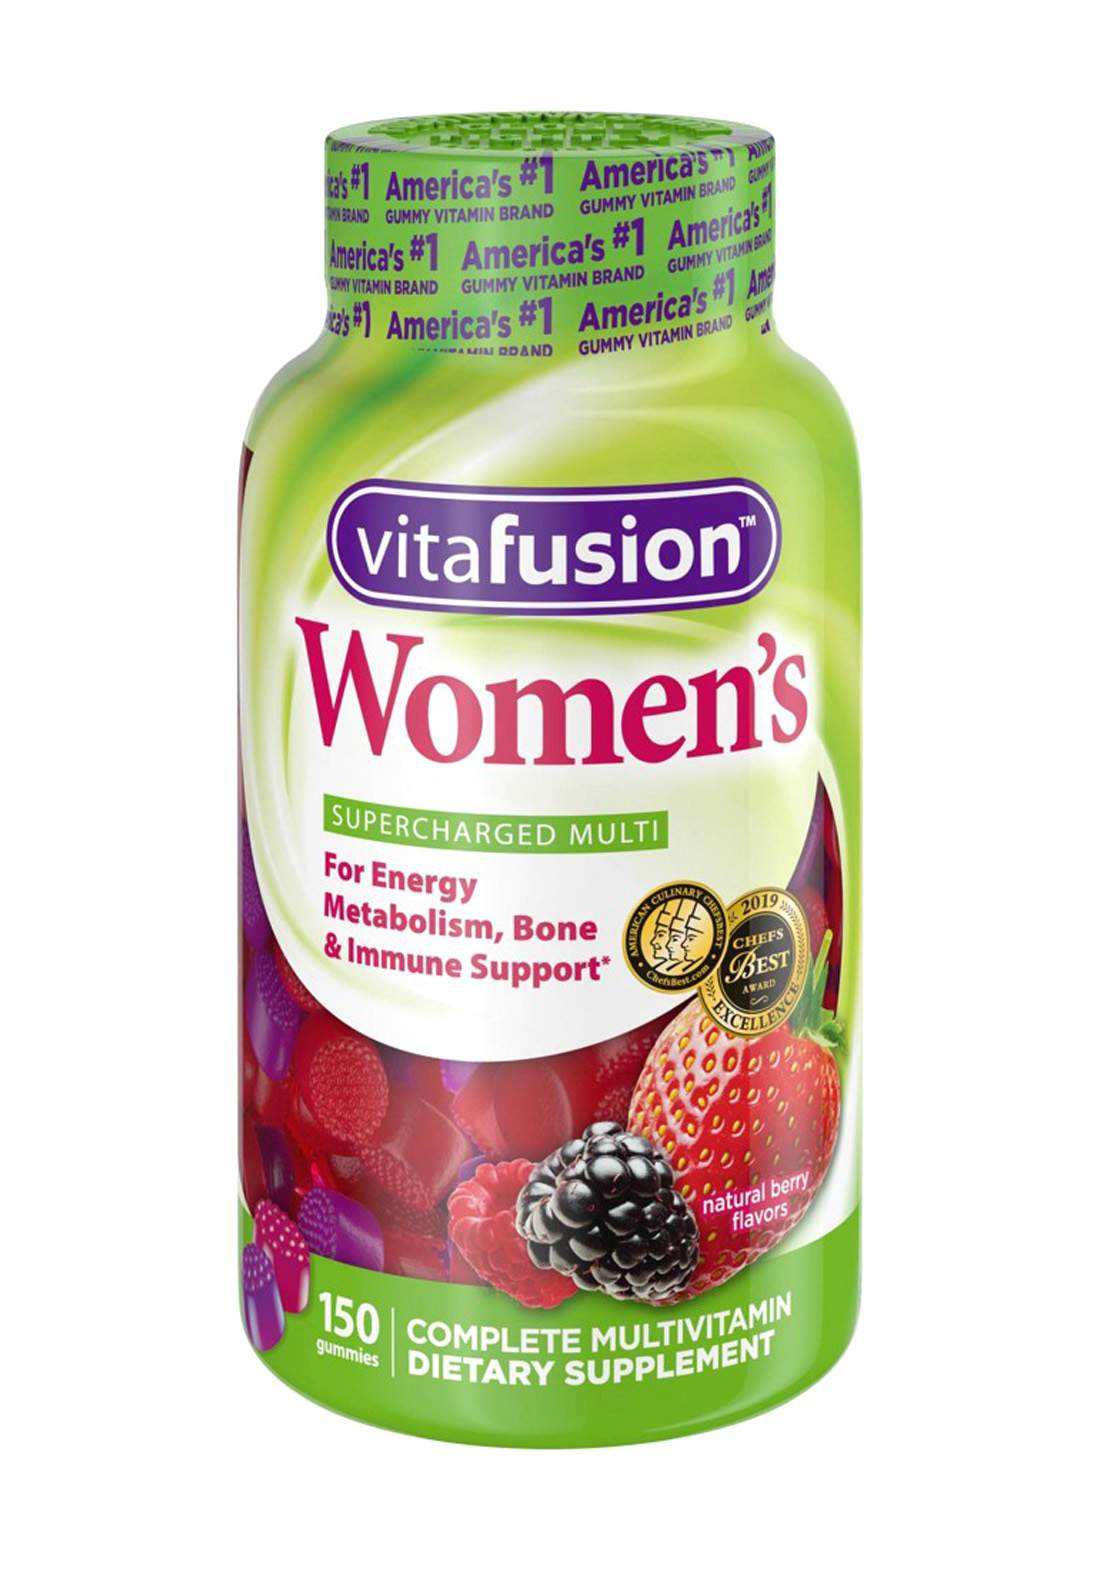 Vitafusion Women's Multivitamin Gummies 150 Gummies مكمل غذائي